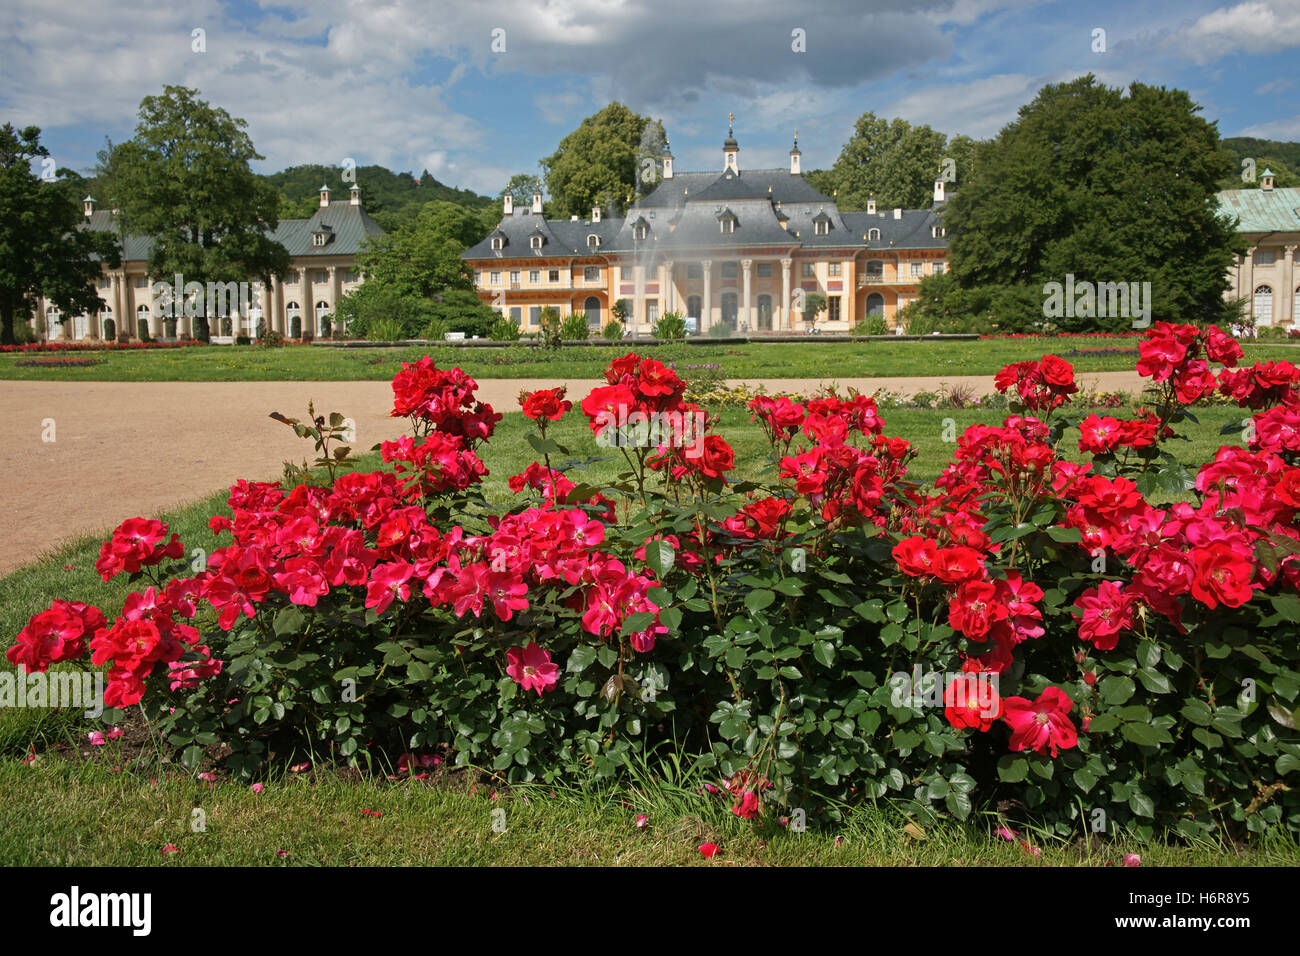 Garden Saxony Dresden Pleasure Garden Gardens Bed Of Roses House